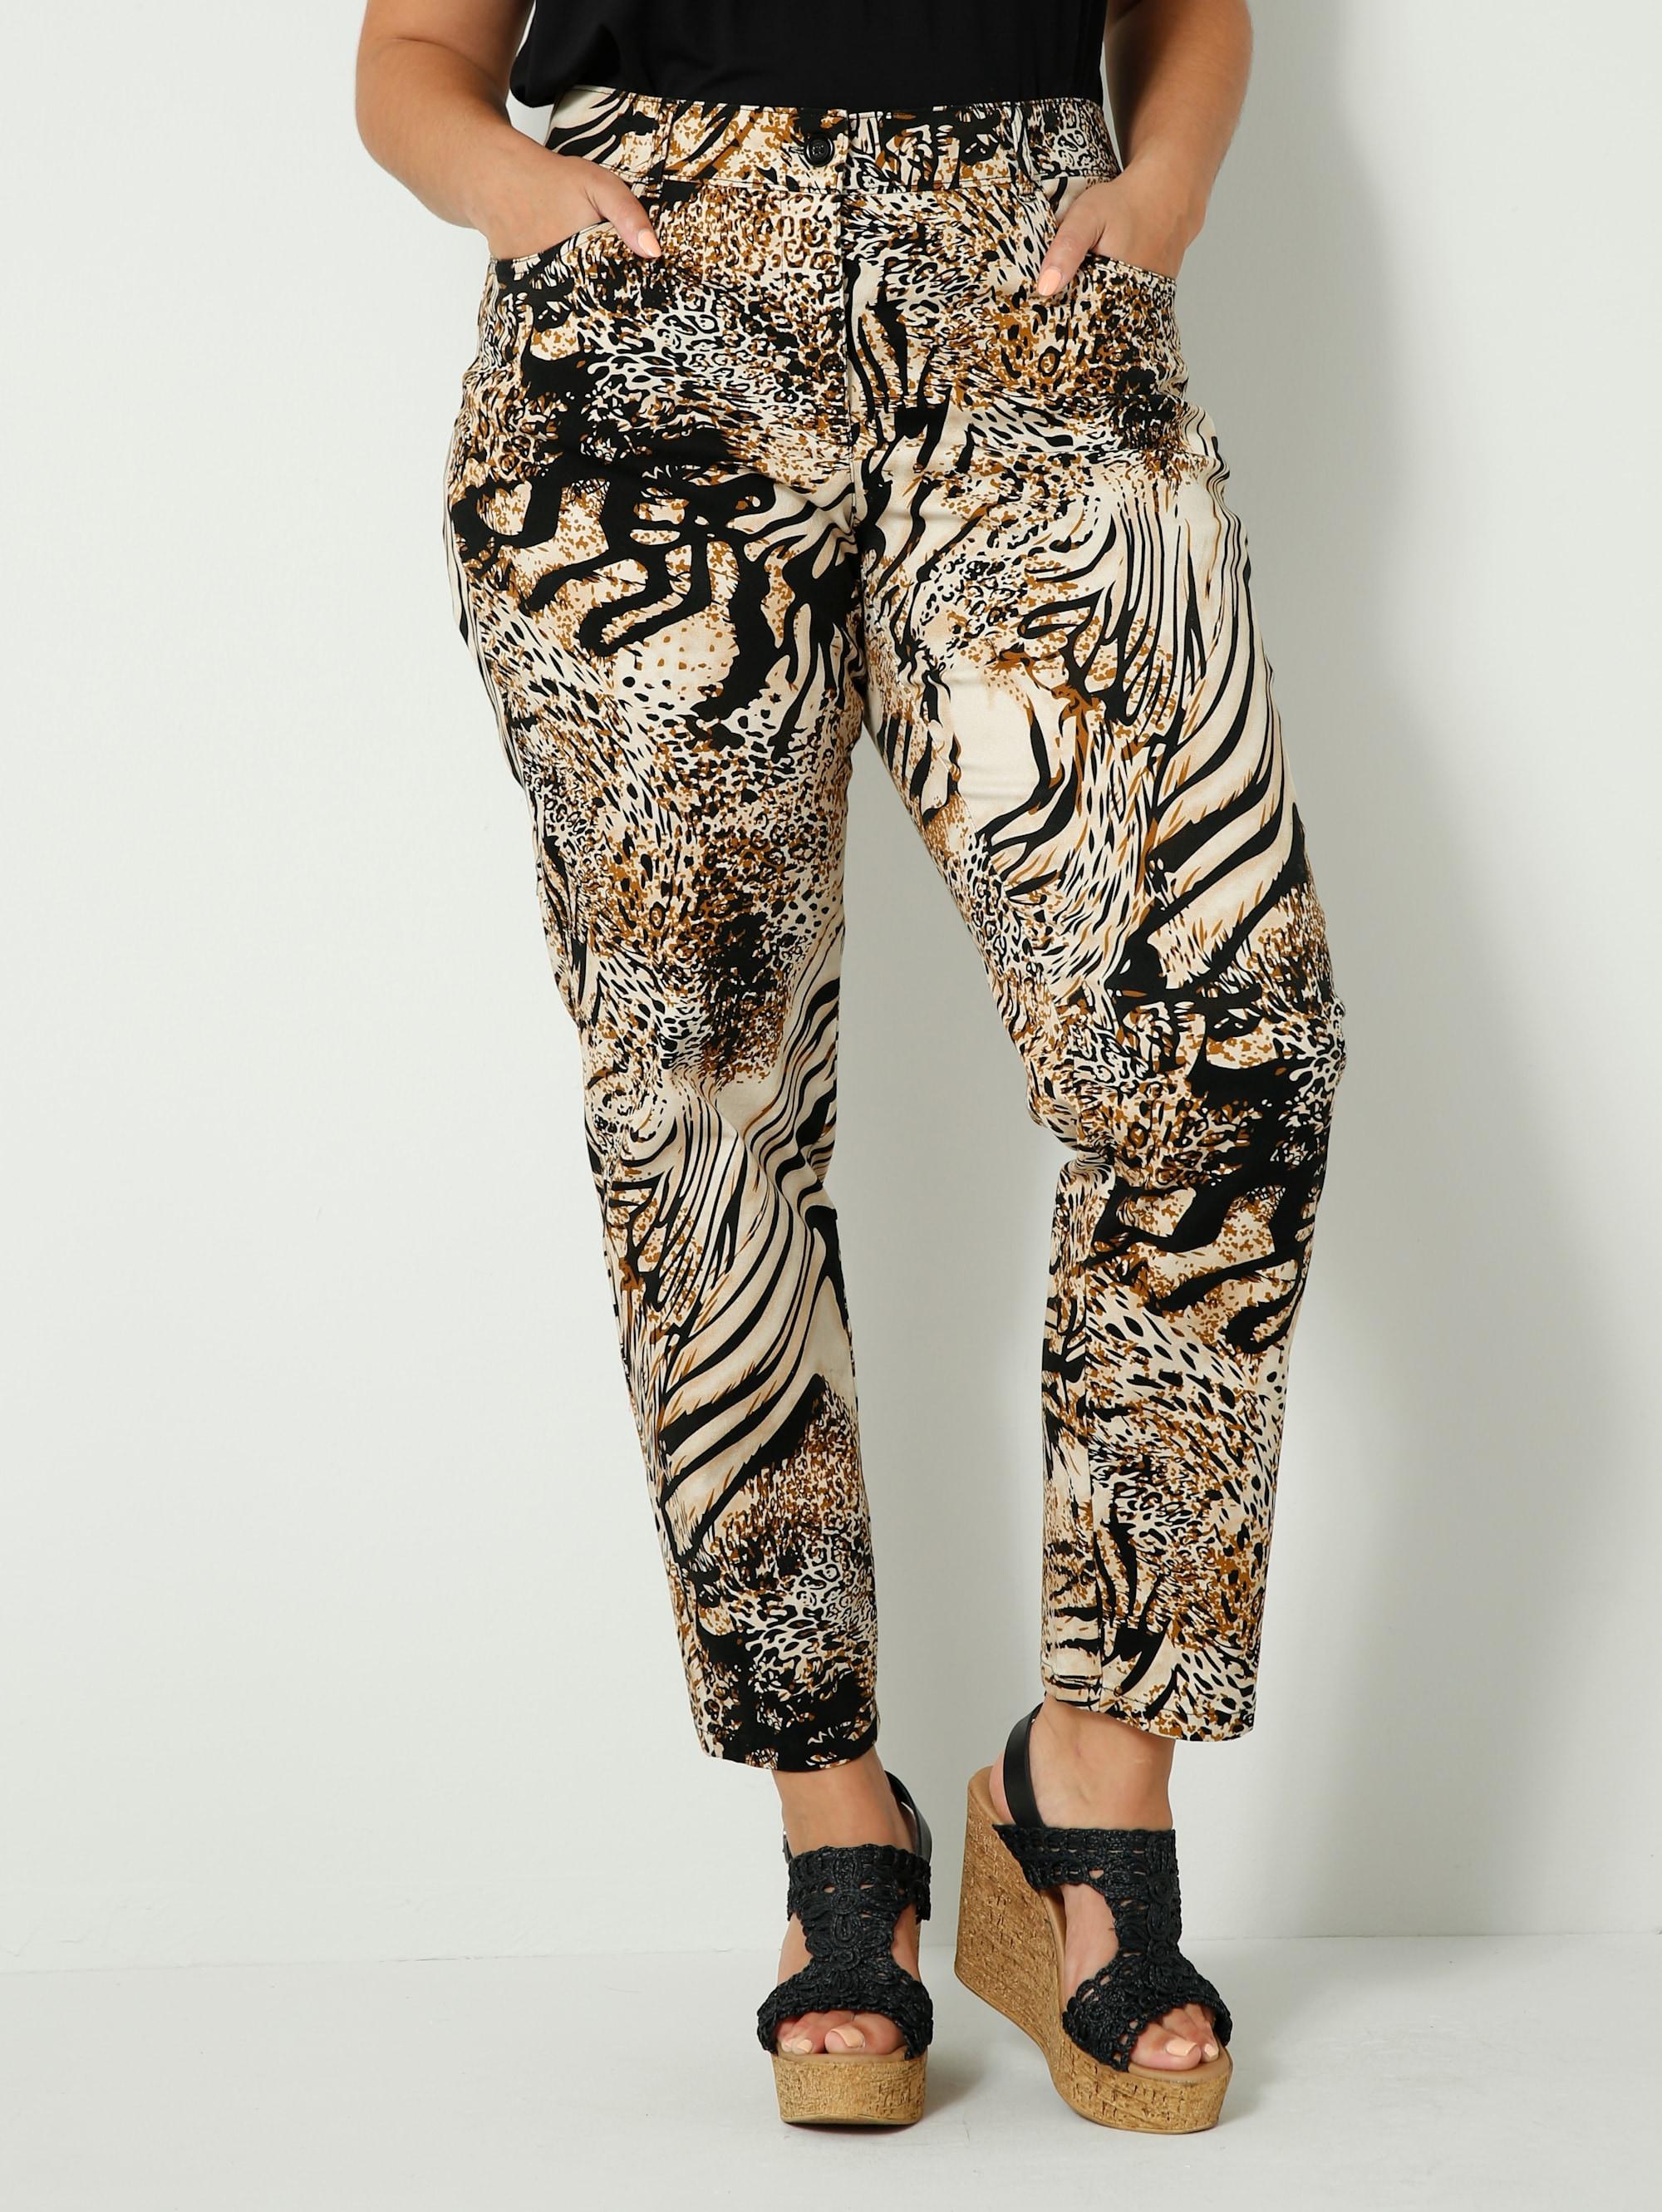 sara lindholm by happysize -  Stoffhose, mit angesagtem Animal Print